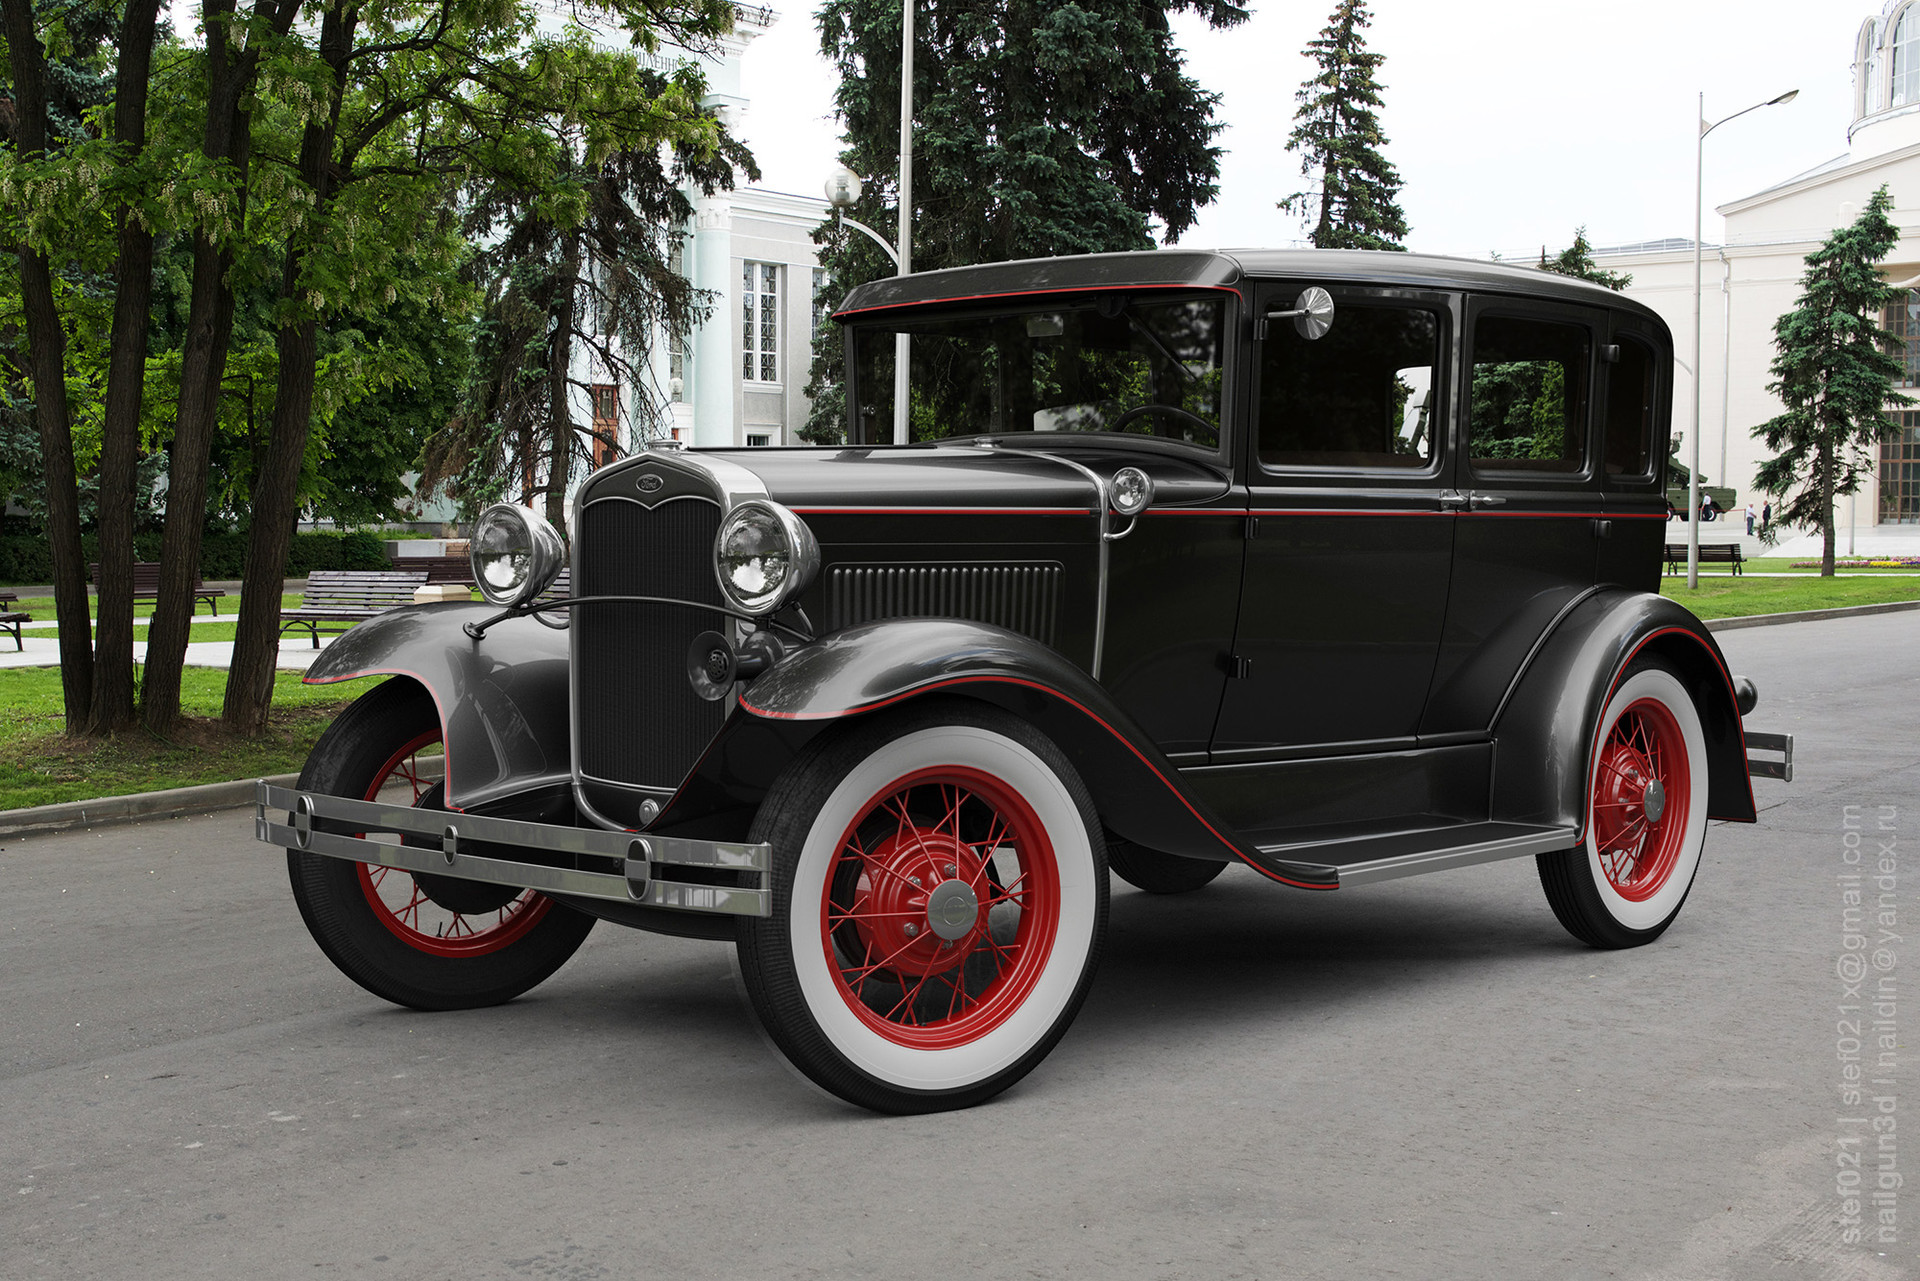 Nail khusnutdinov a0003 ford a fordor 1931 render 1